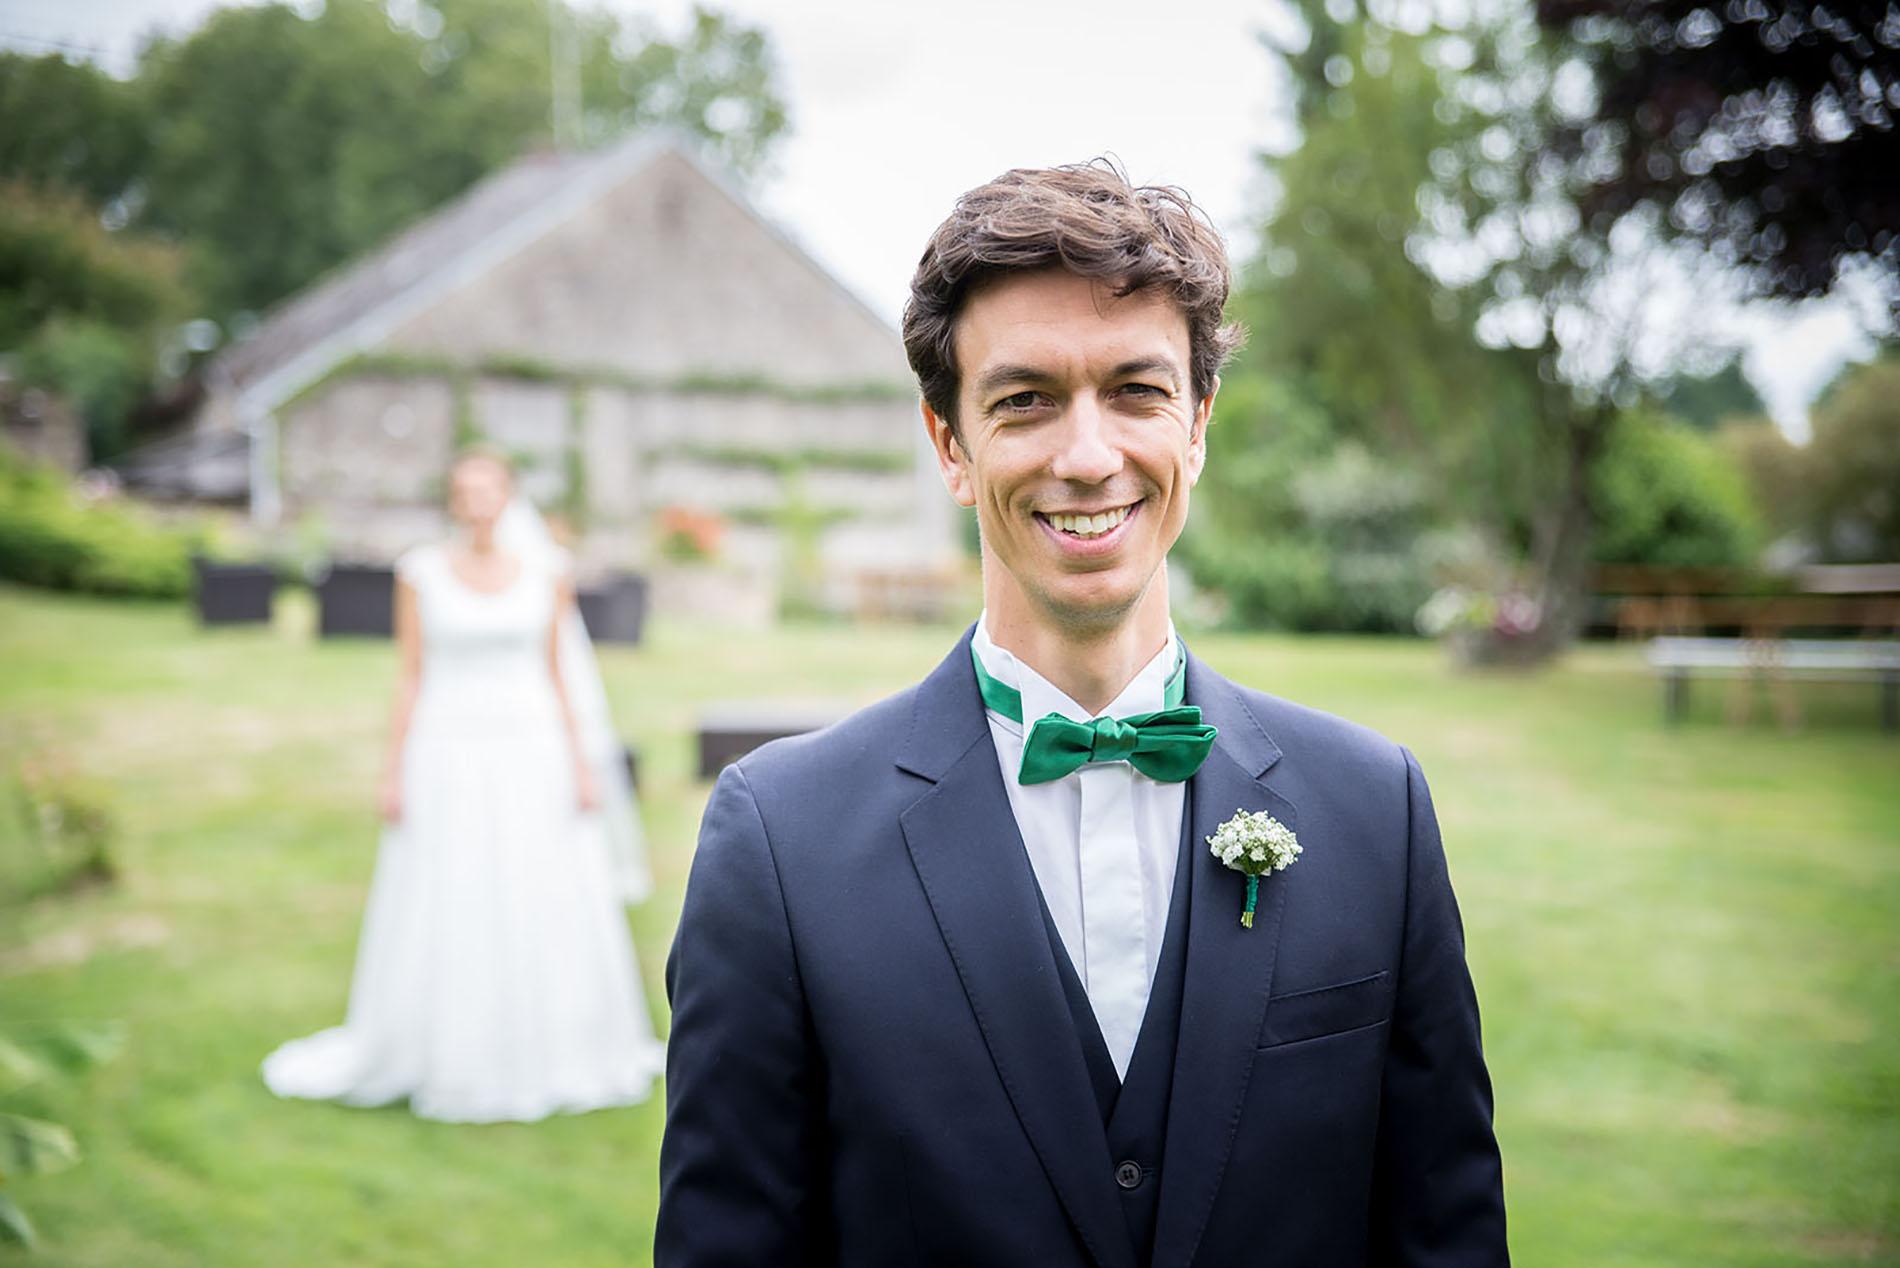 Photographe mariage limoges 41 - Mariages